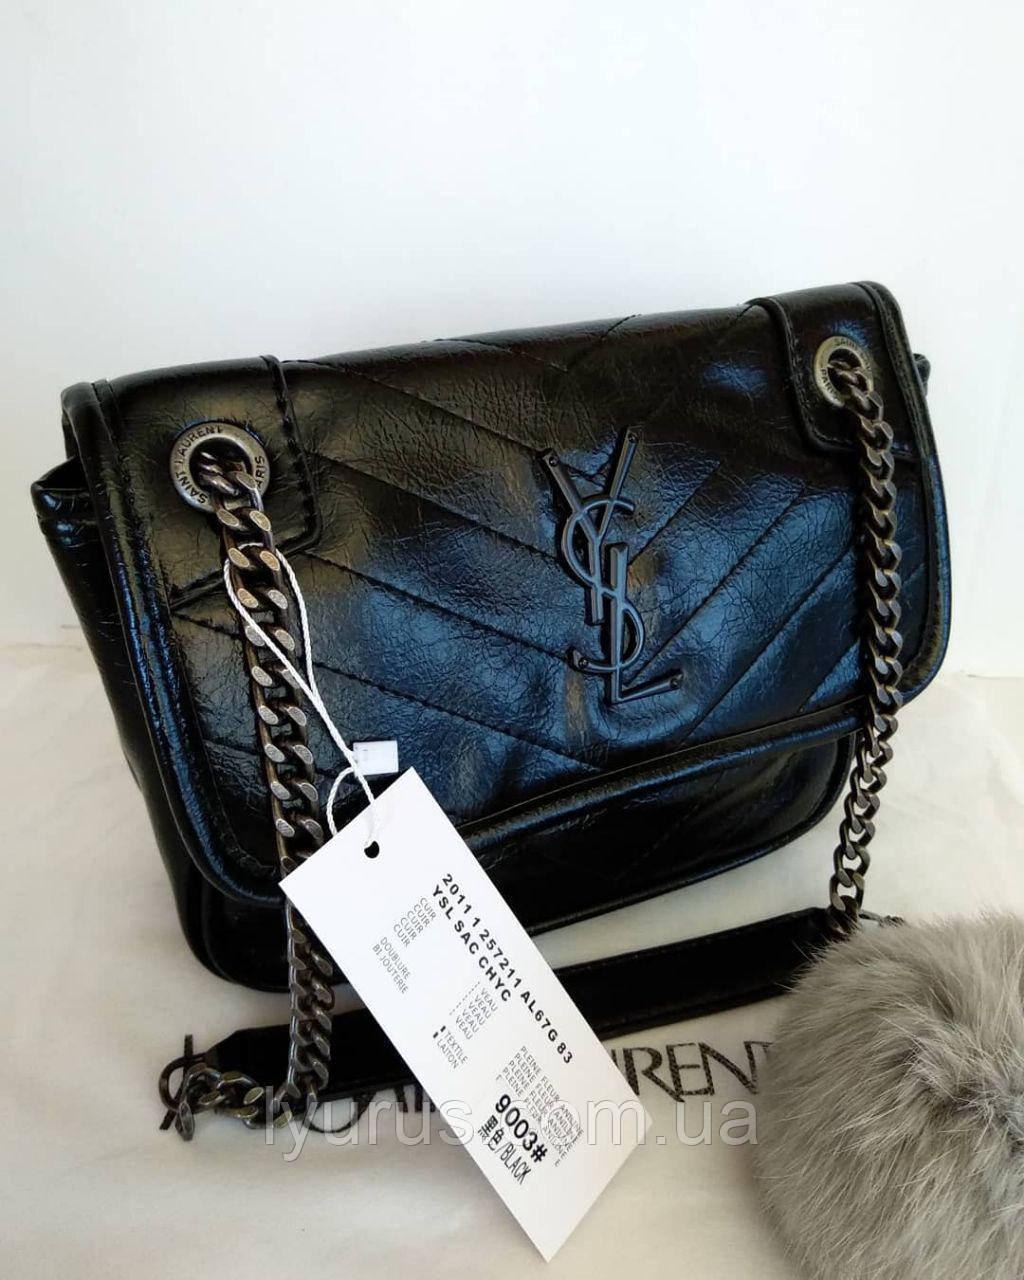 e81124ea283a Сумка женская Yves Saint Laurent: продажа, цена в Полтаве. женские ...